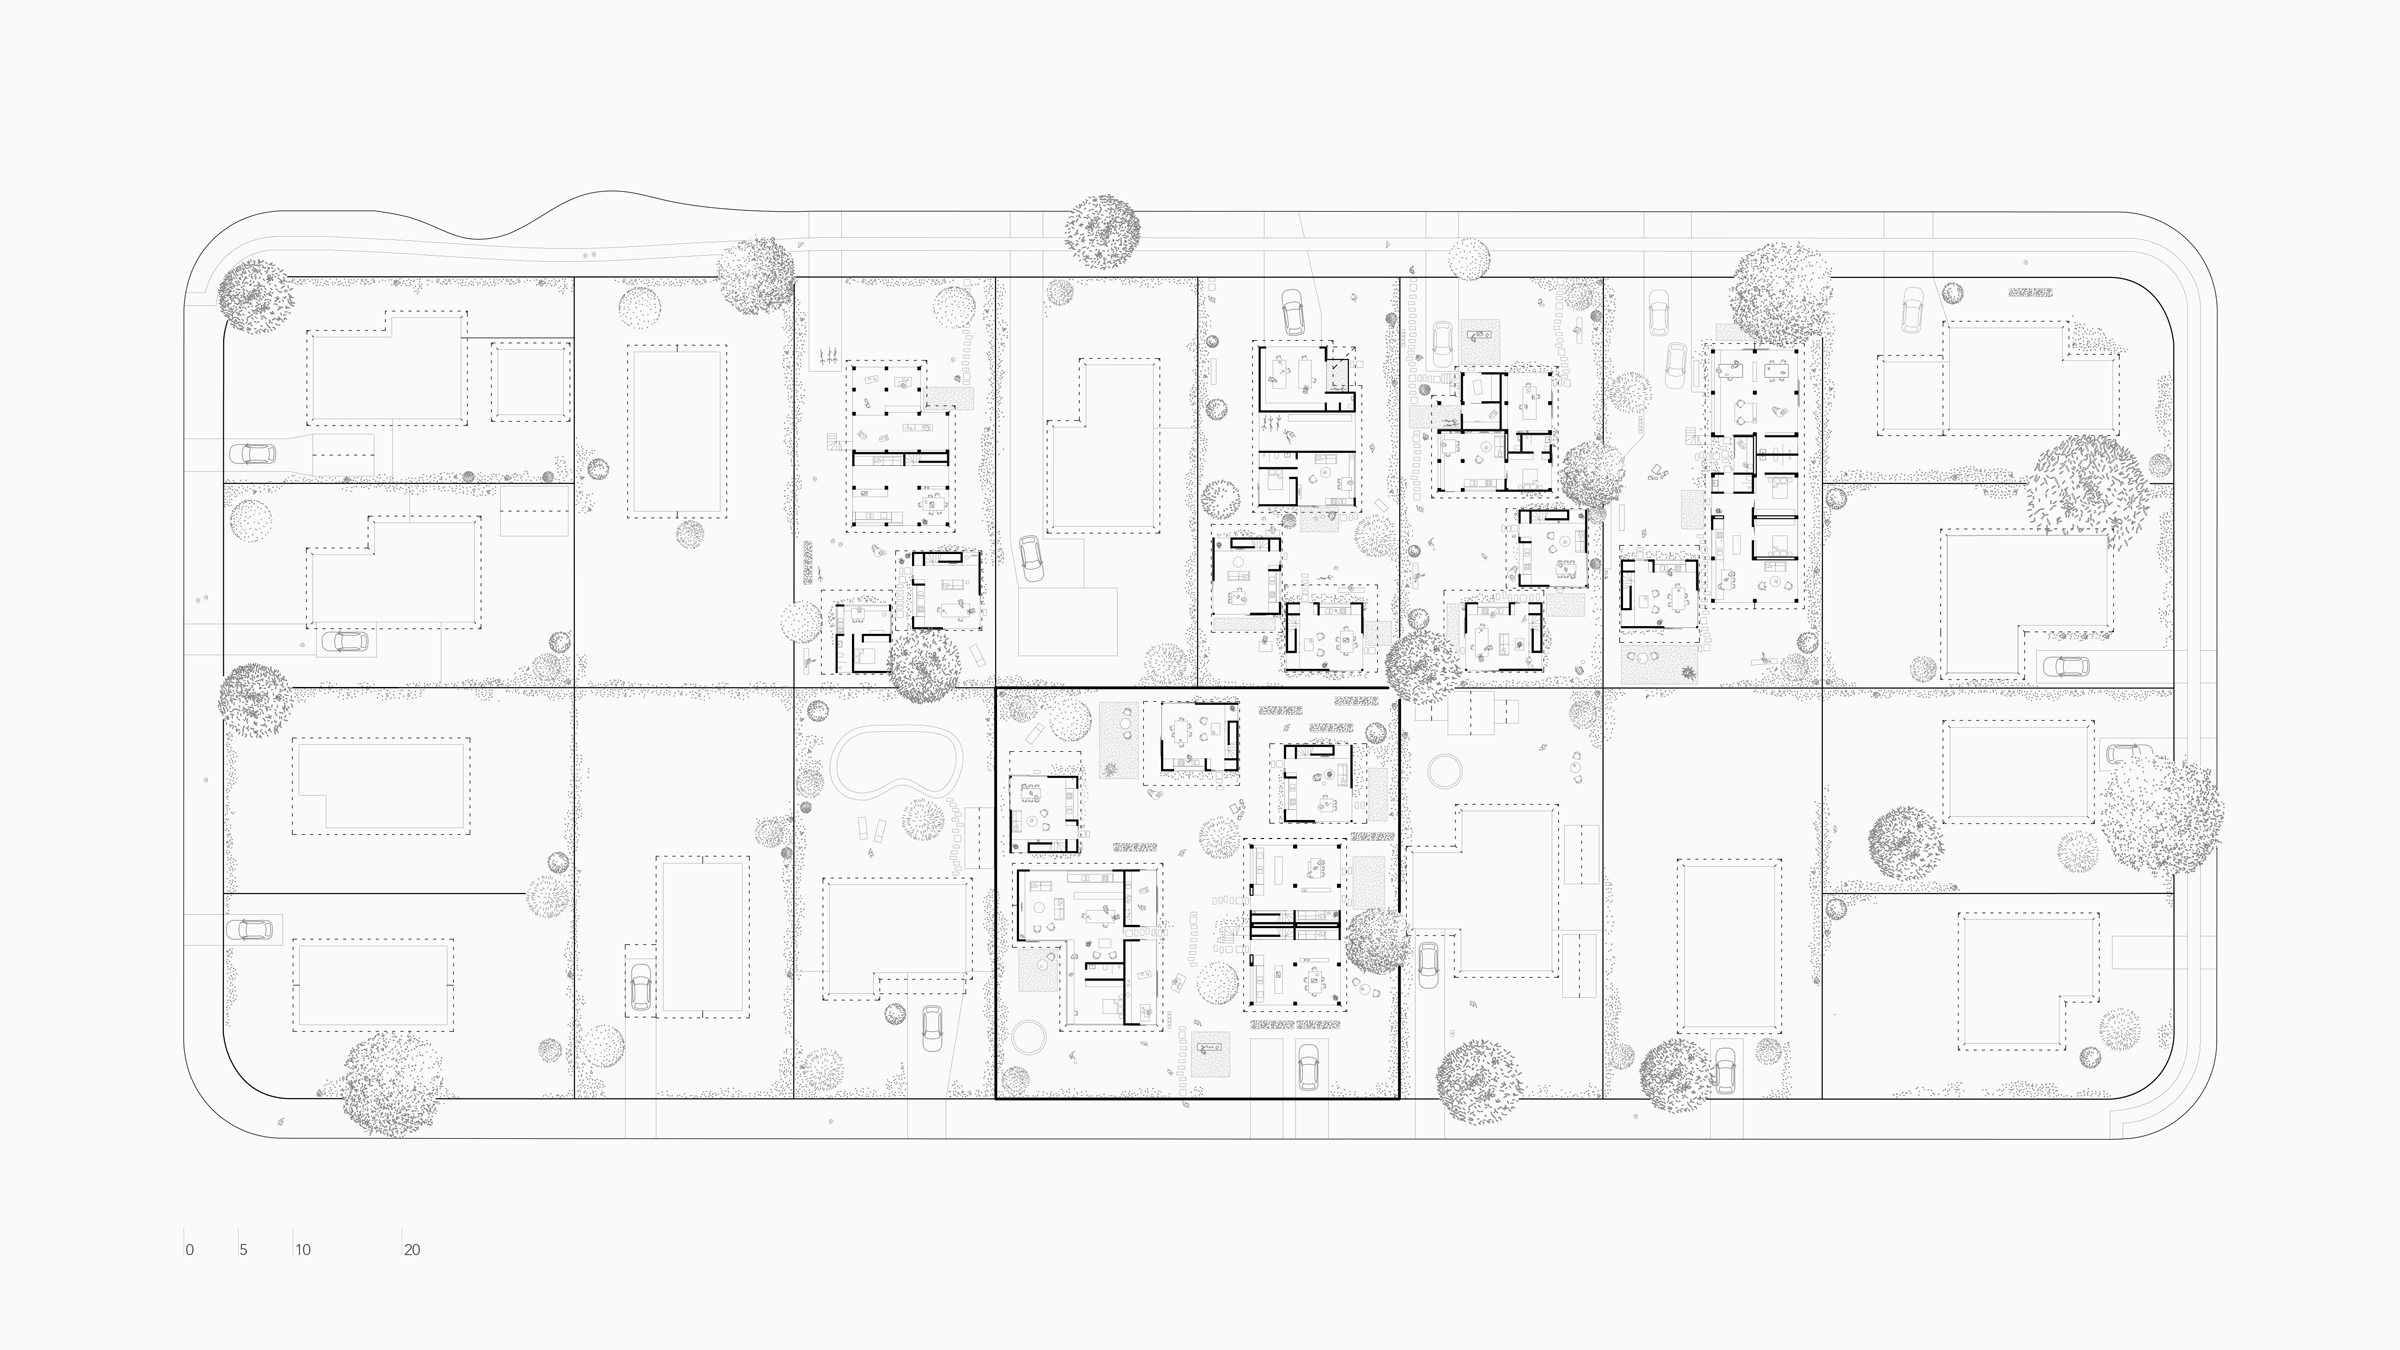 171212-Dappled-Dwellings-Site-Plan-Stage-04.jpg